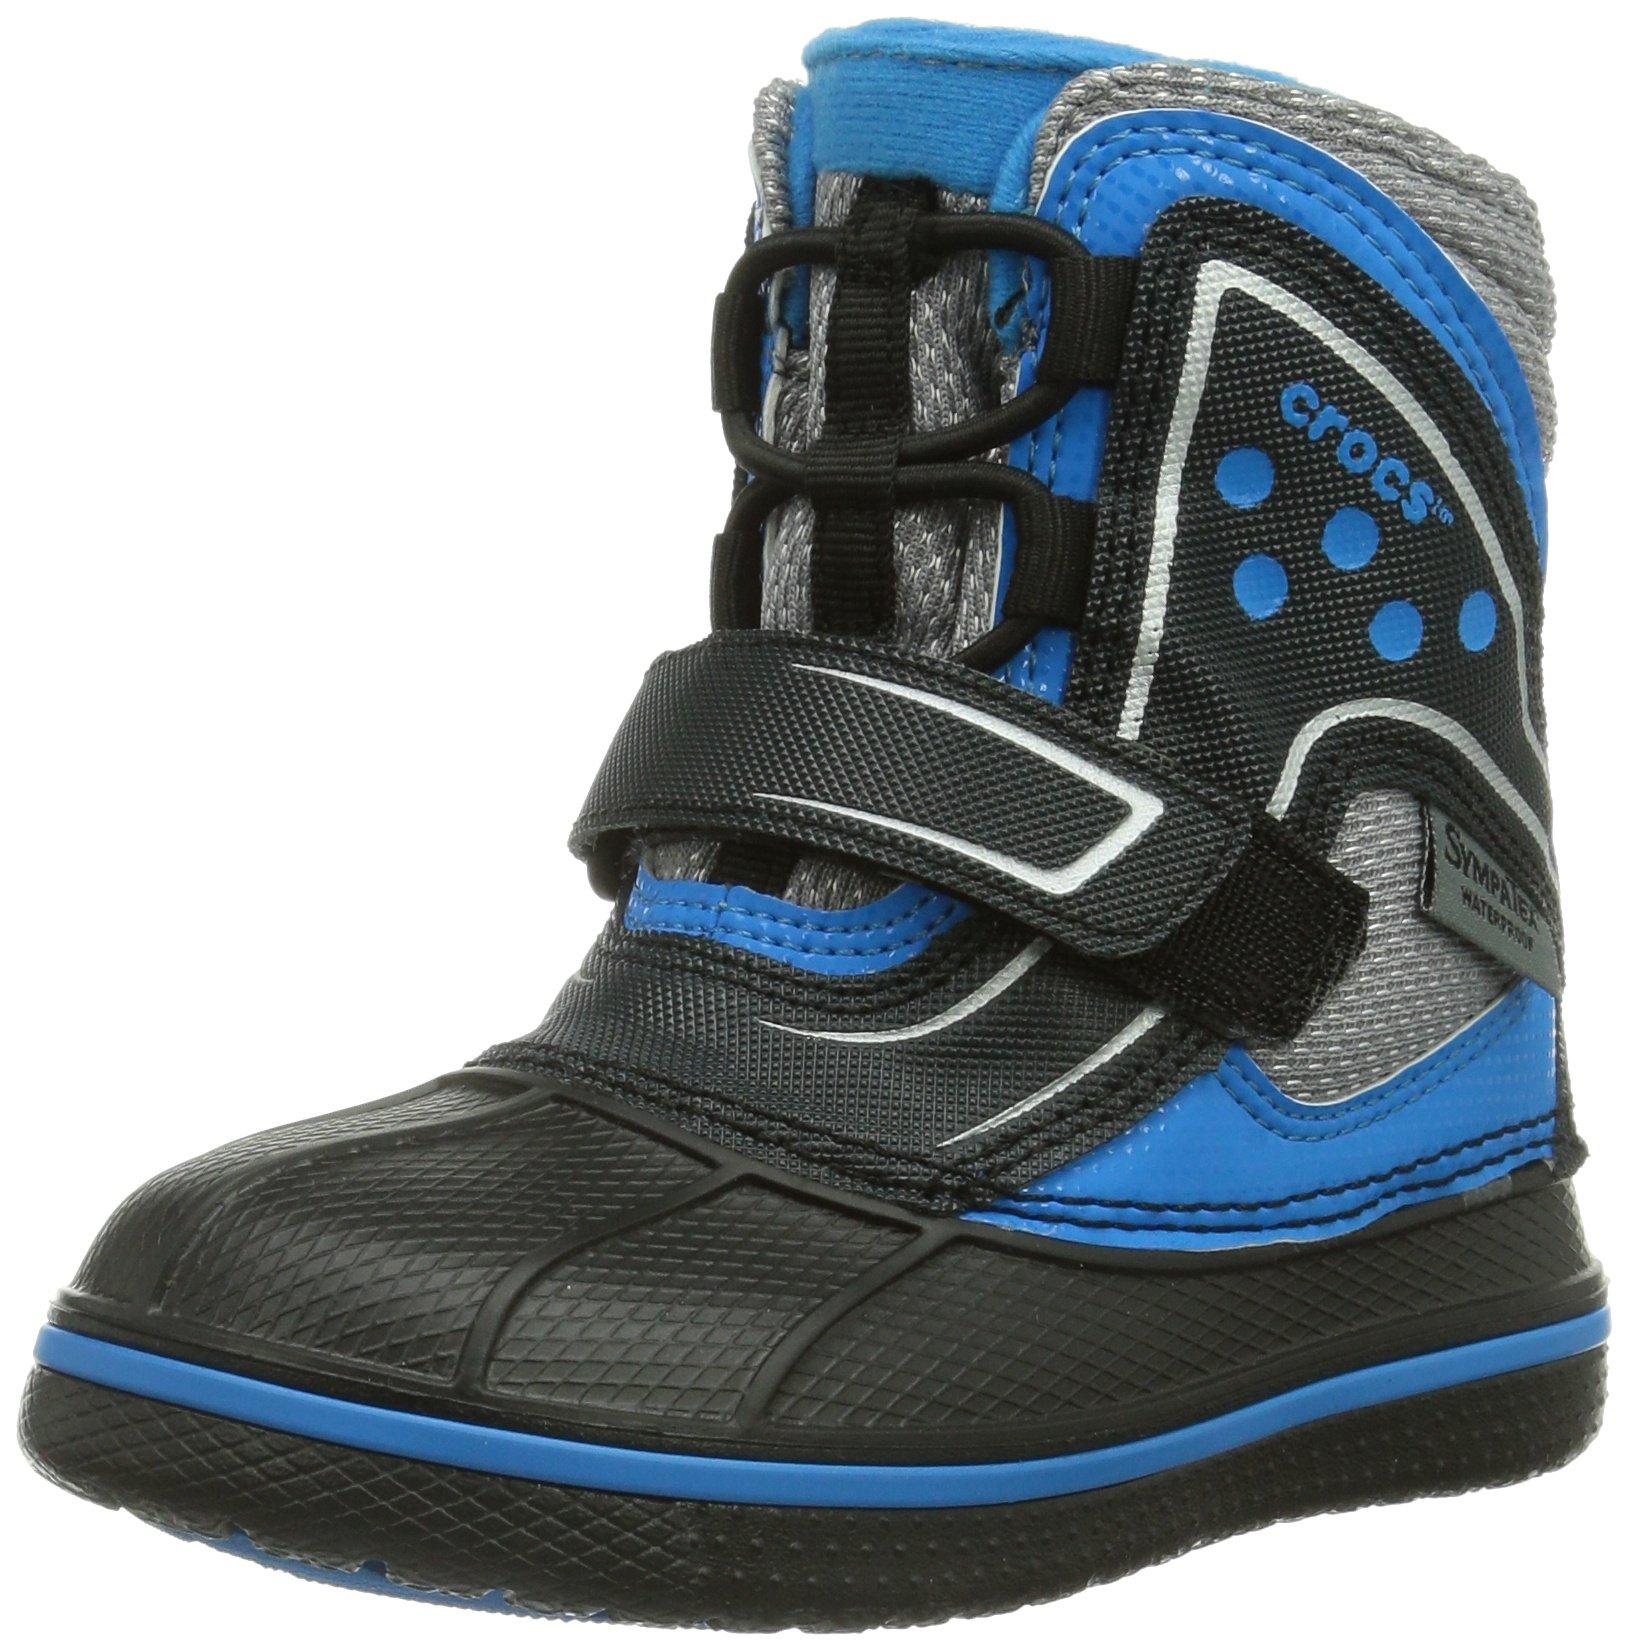 crocs AllCast Waterproof Snow Boot (Toddler/Little Kid/Big Kid), Black/Ocean, 12 M US Little Kid